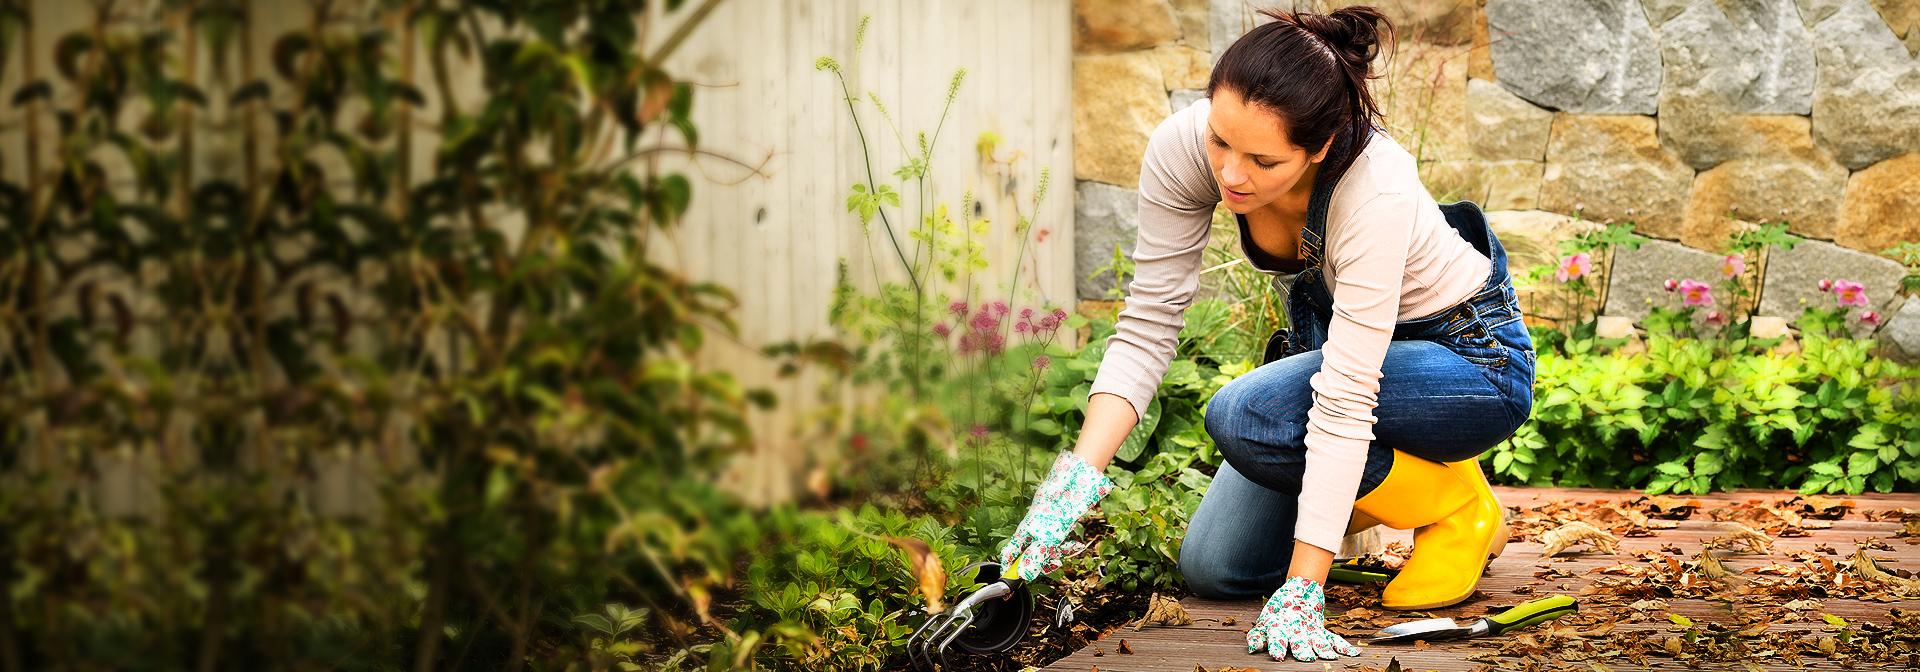 empresa jardinagem asseio camboriu condominio bioart jardins